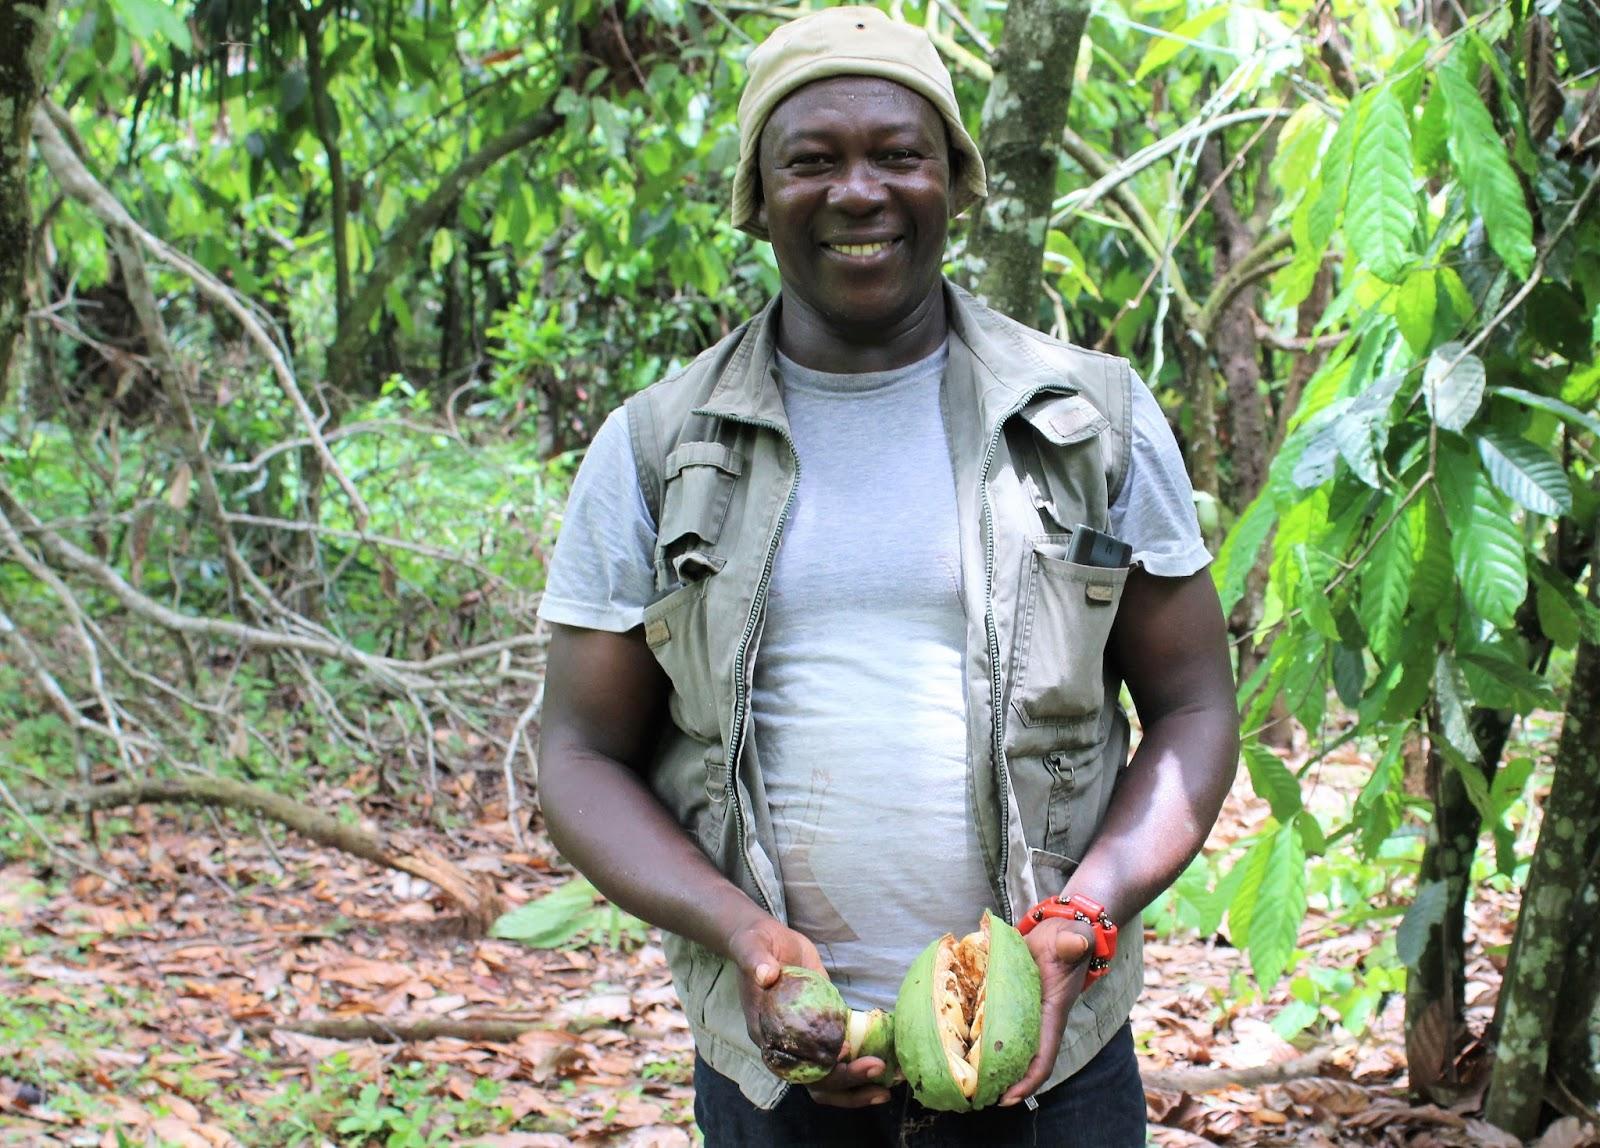 Cultural Significance of Kolanut…A Symbolic African fruit